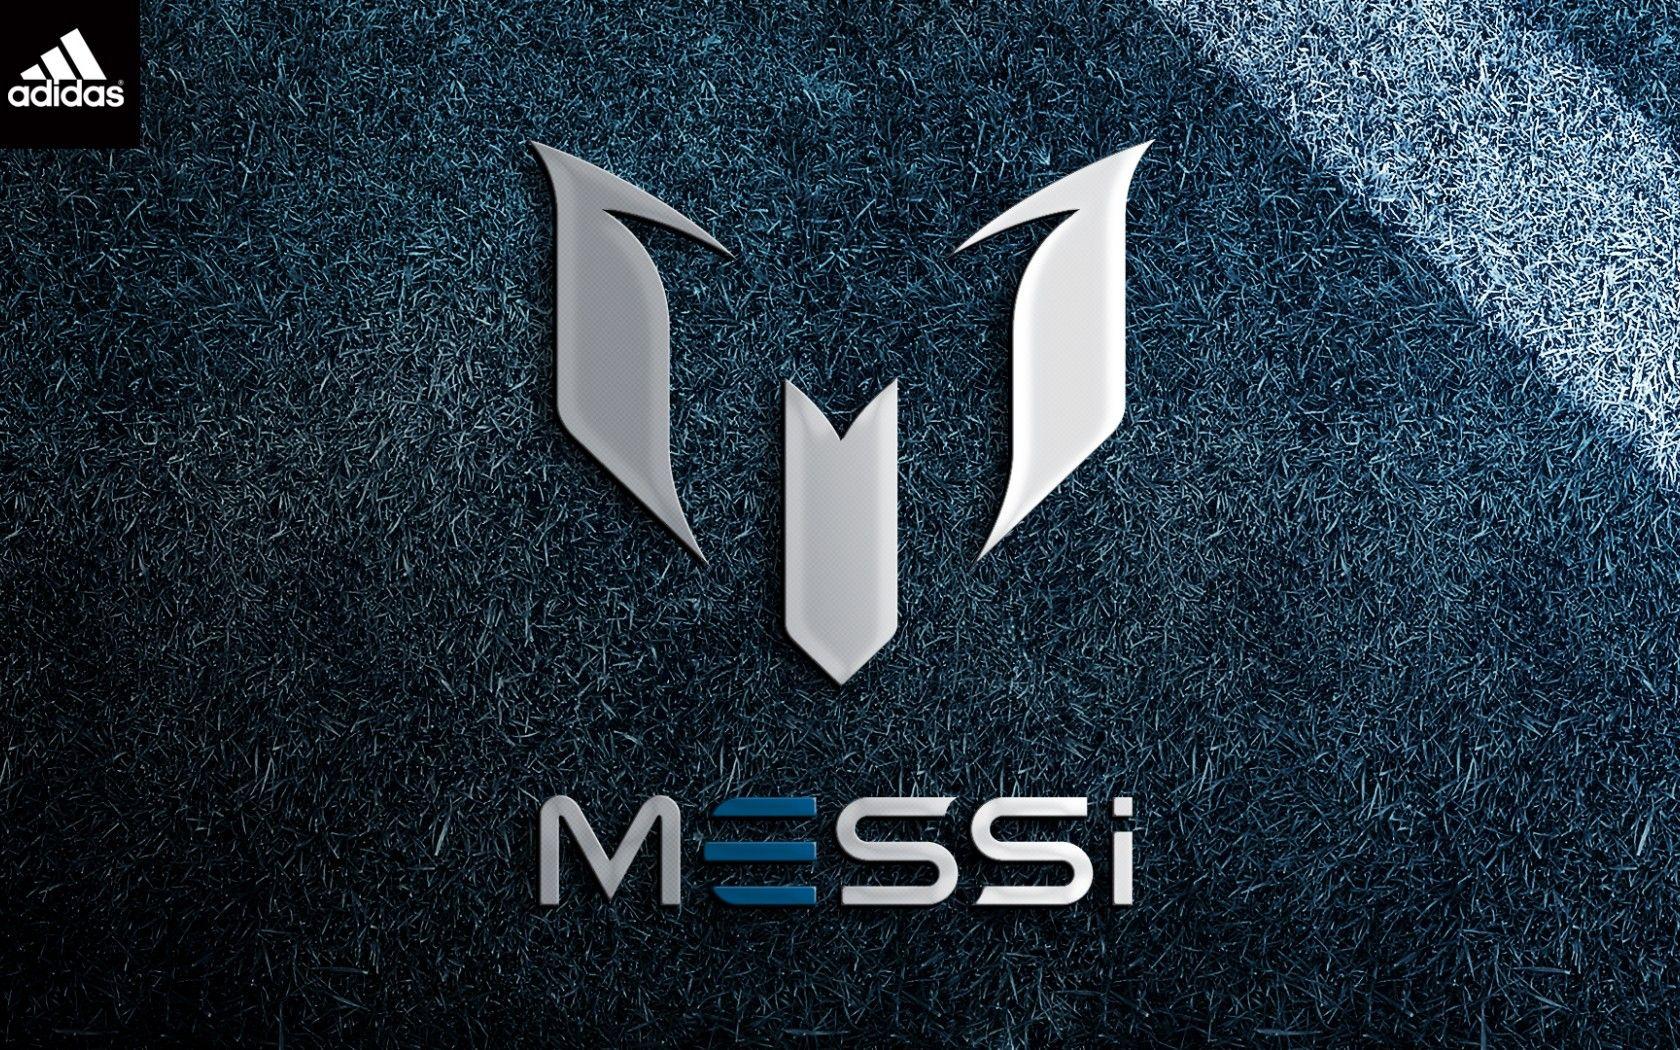 Месси обои на рабочий стол 2018 7